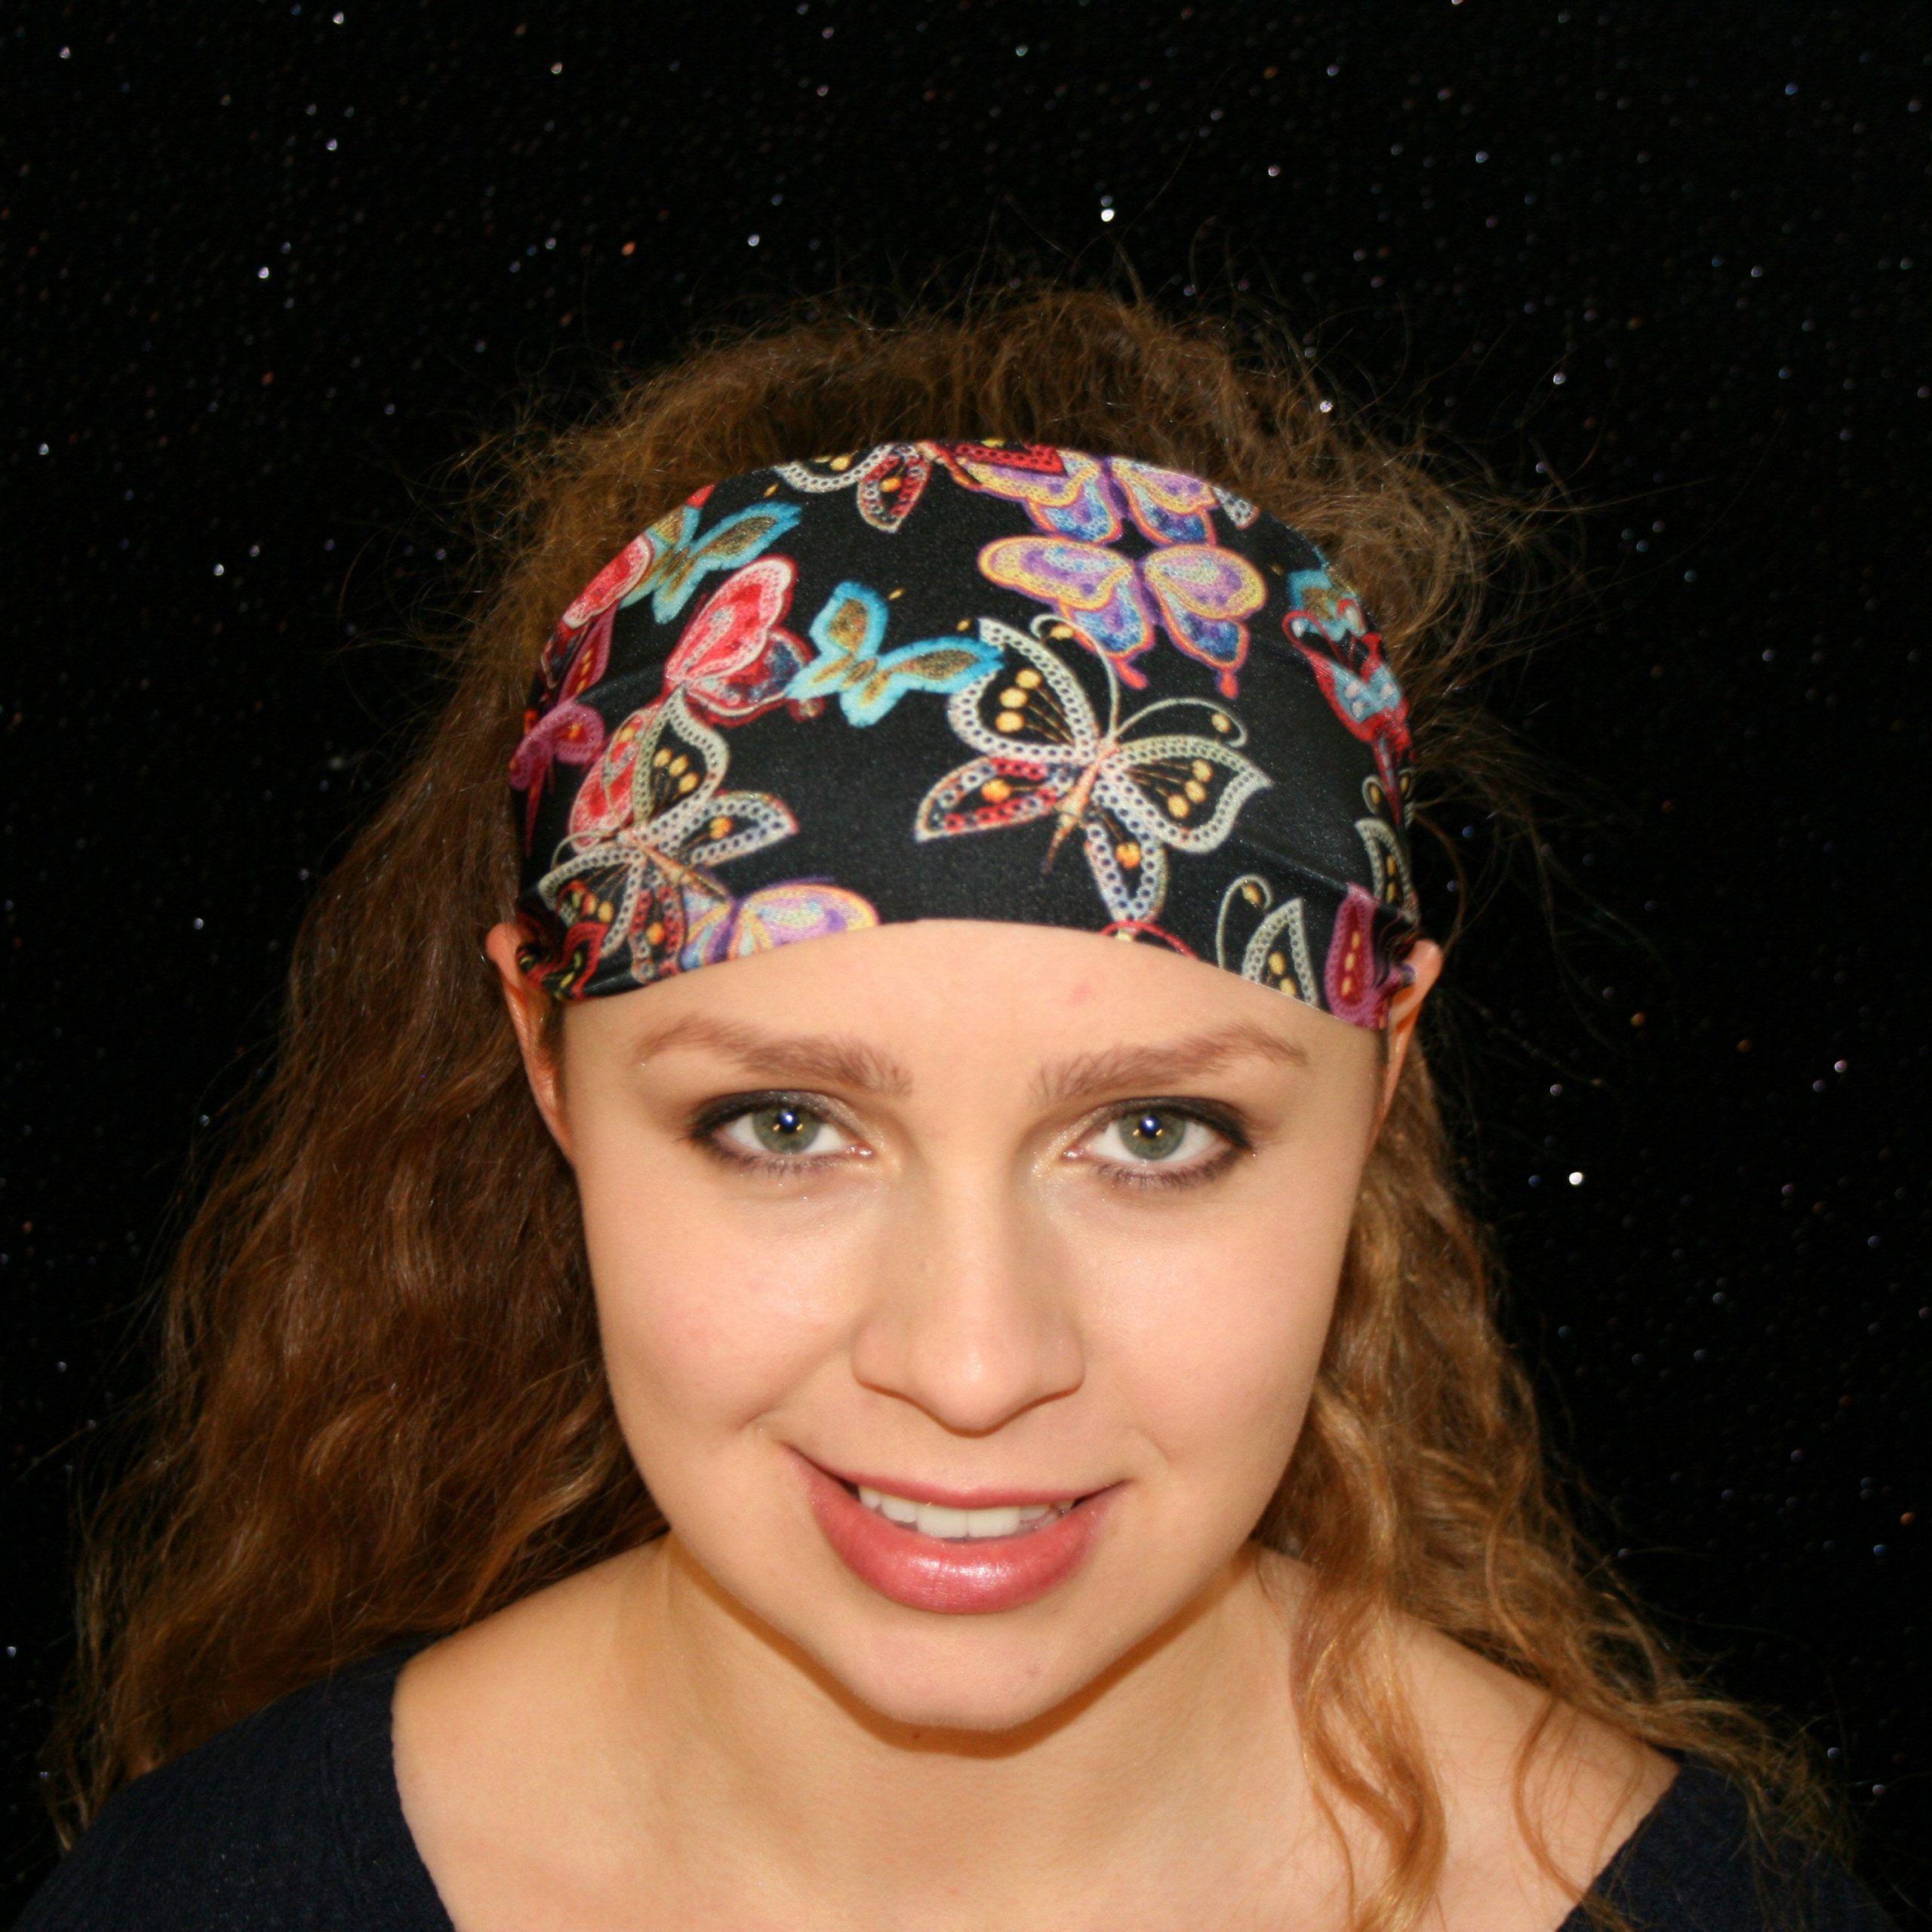 Revelry Yoga Headband Workout Headband Running Headband Boho Headband Wide Headband Fitness Headband...